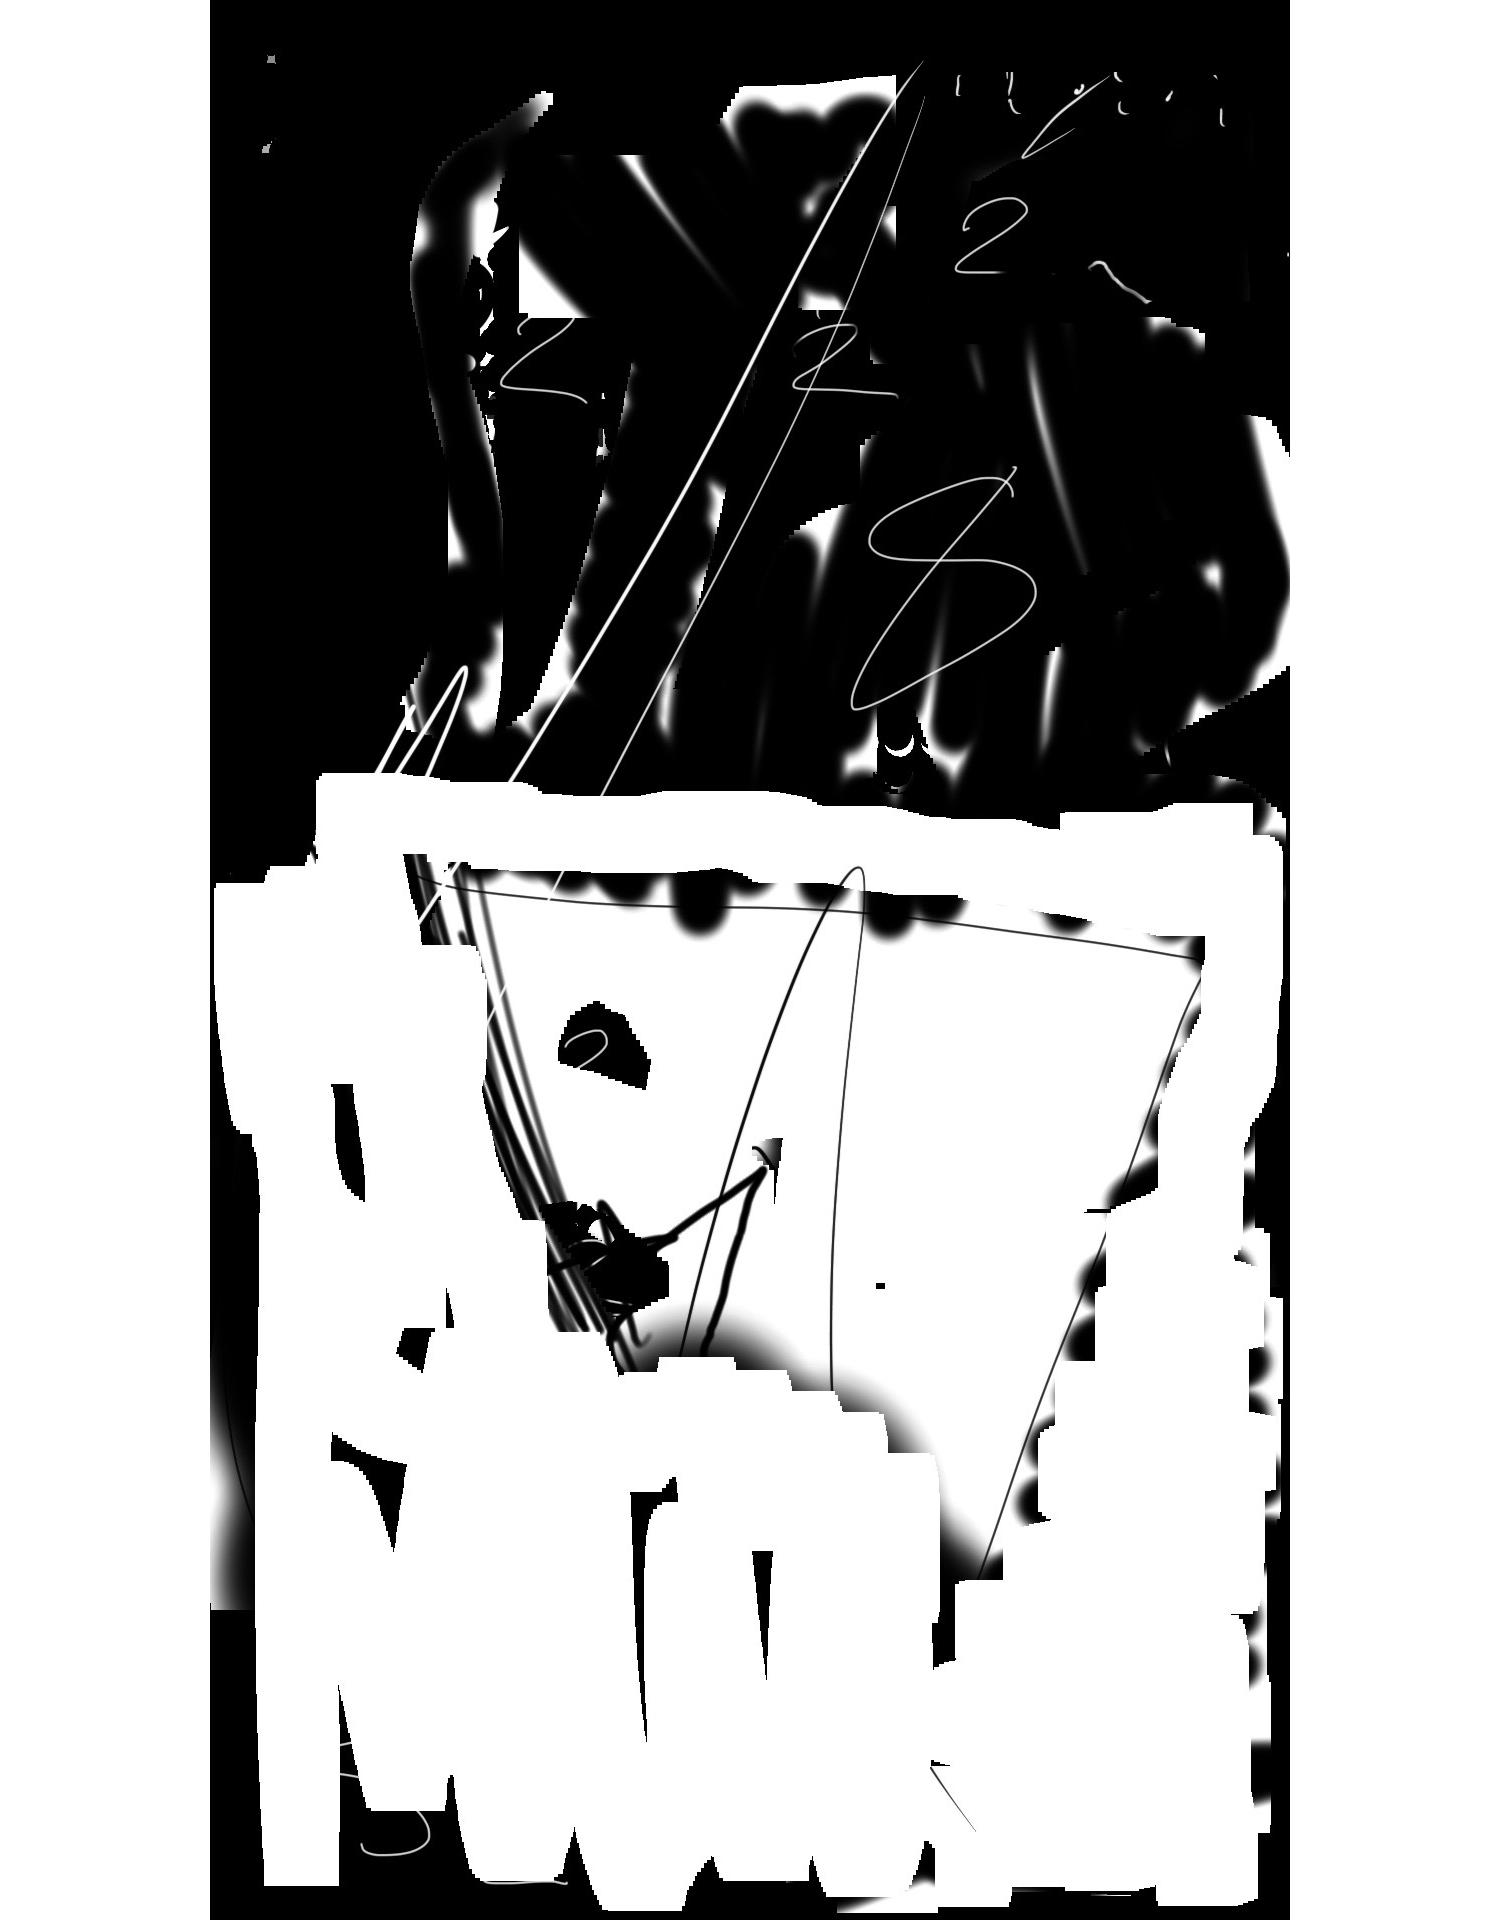 GAU THE BEAUTIFUL FORMULA COLLECTIVE Daniel Geiger, Oleksiy Koval, Veronika Wenger Digital painting